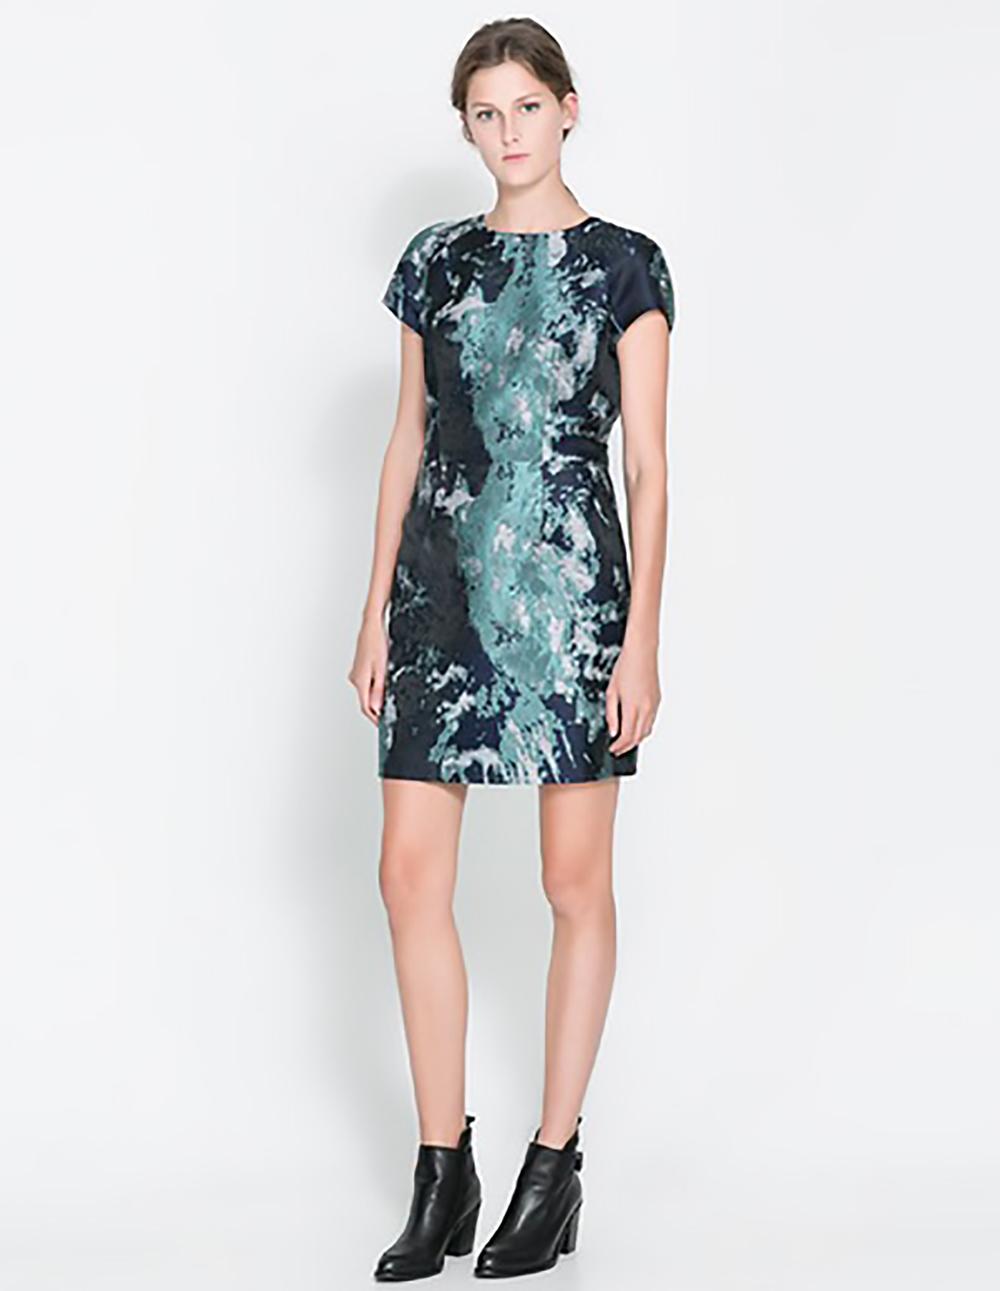 zara jacquard dress short dresses 1500.jpg